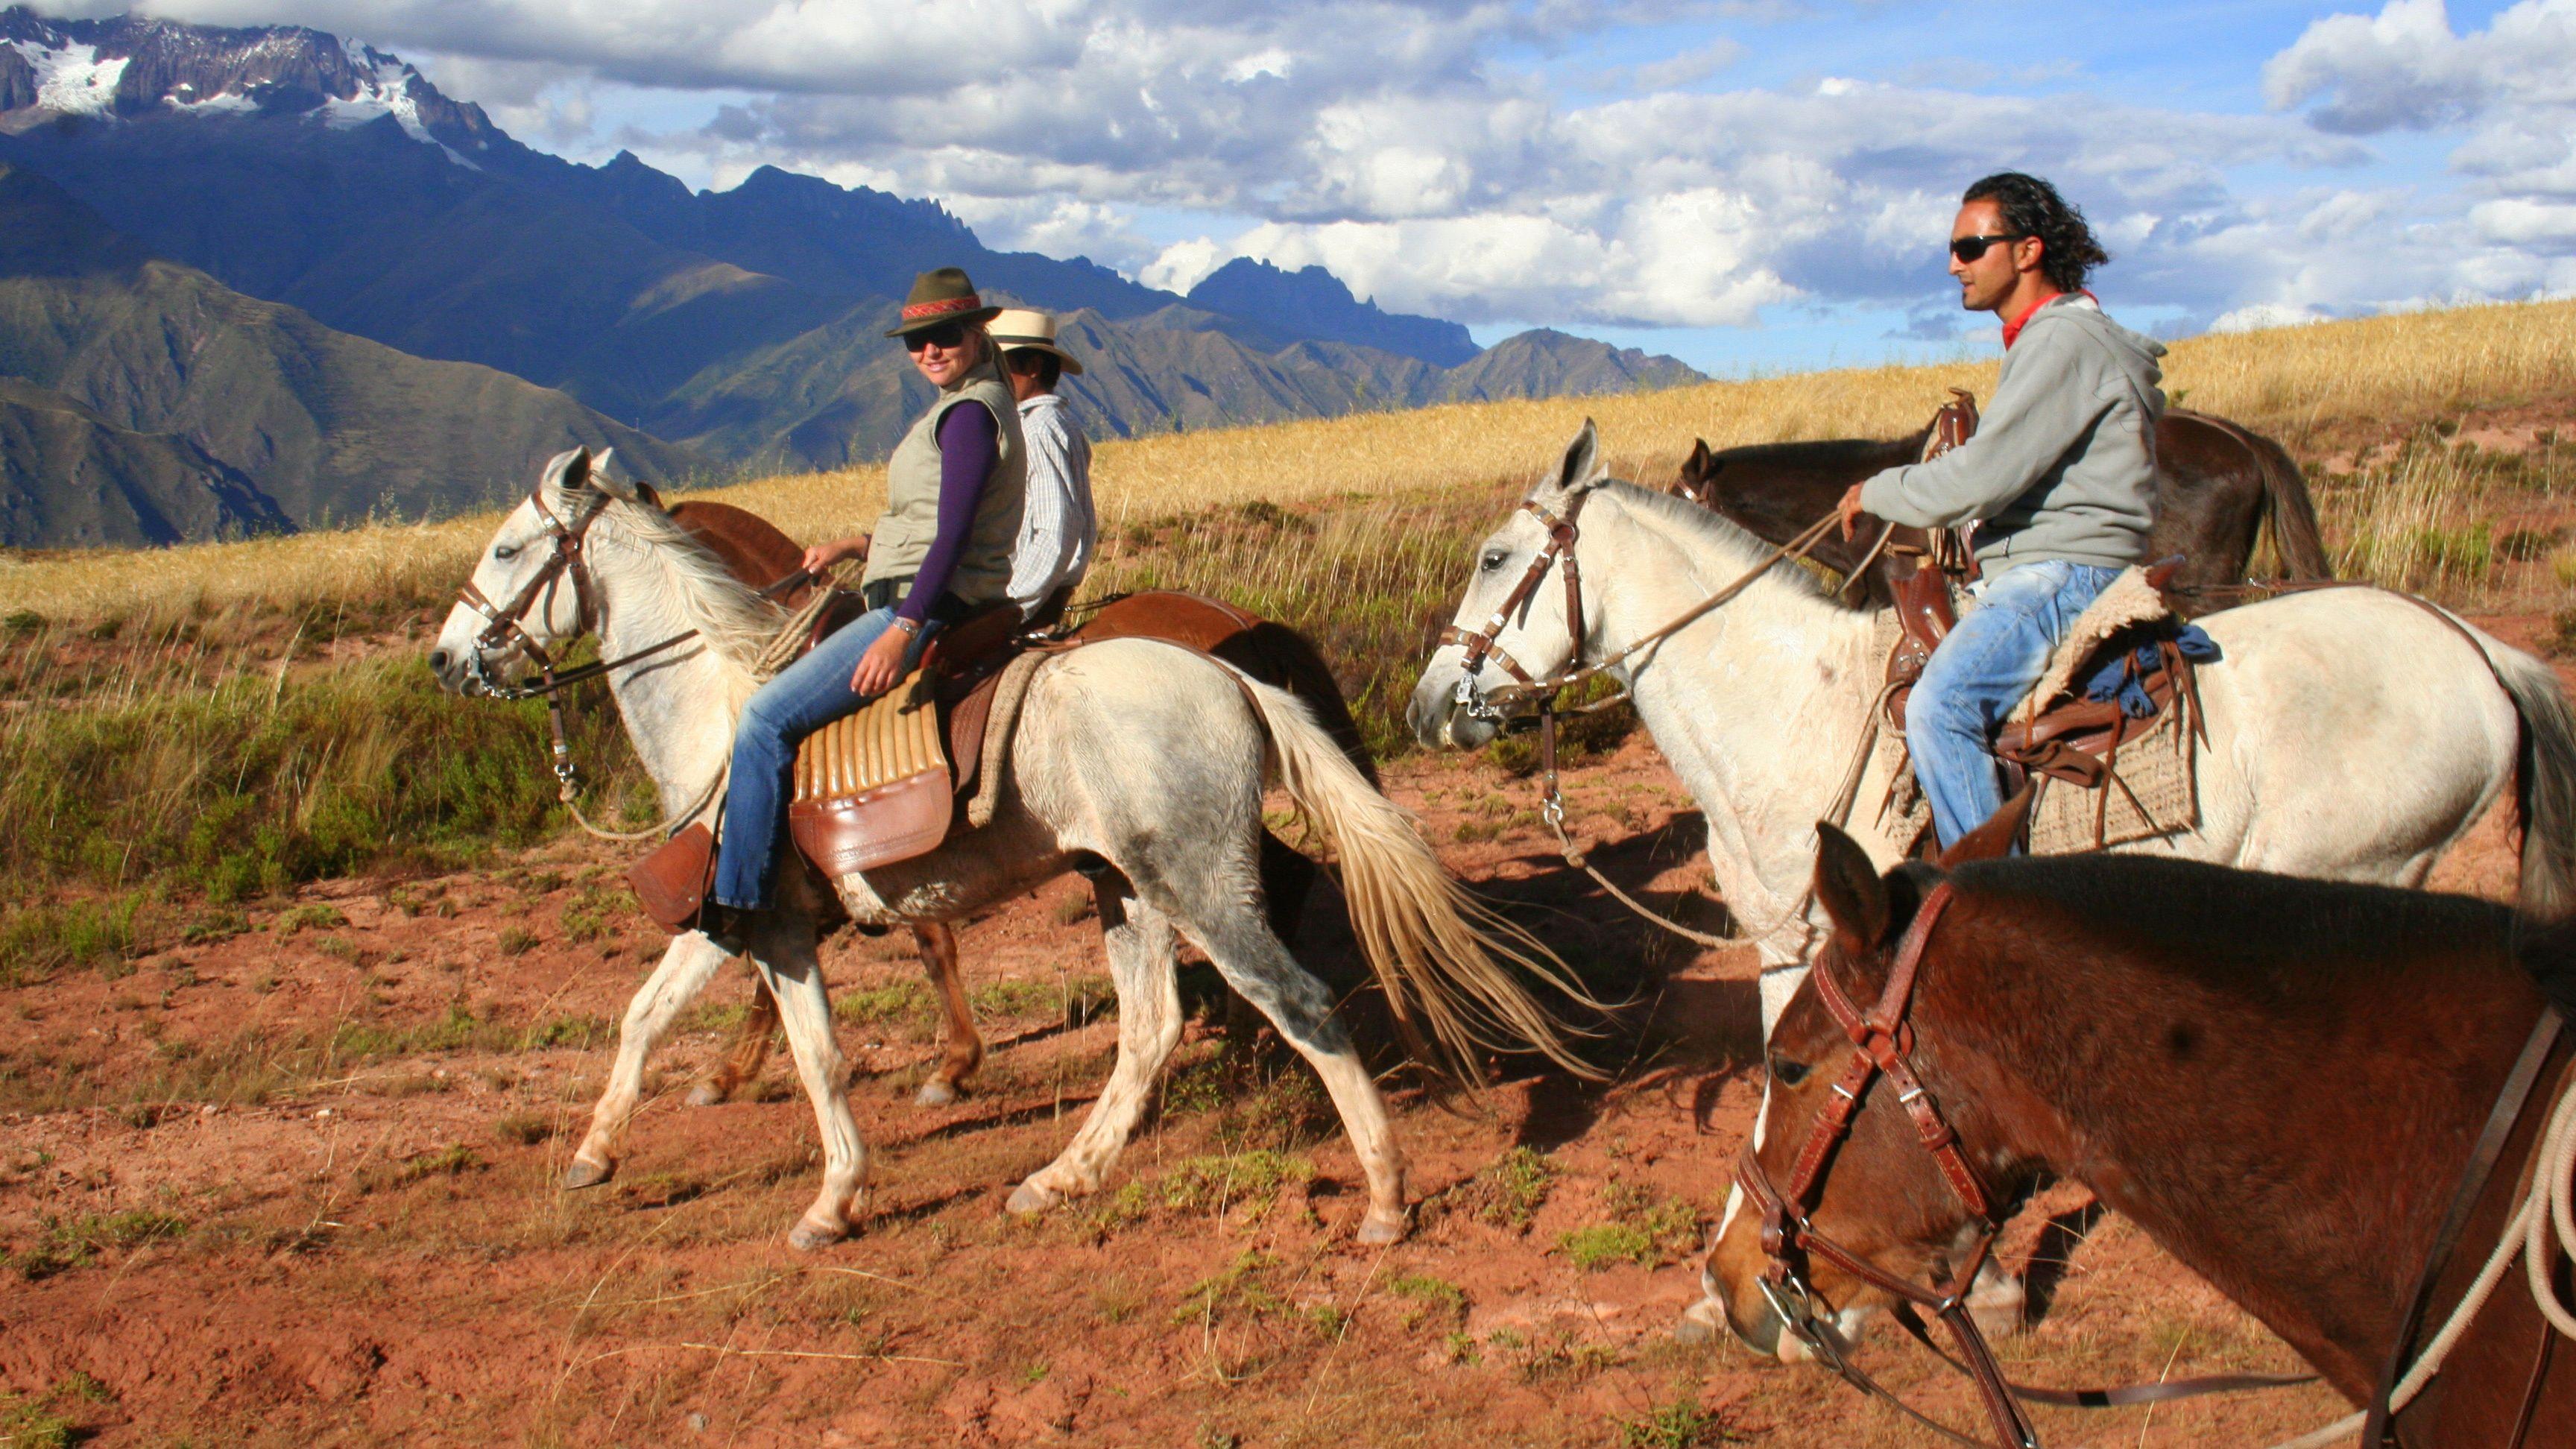 Half-Day Horseback Riding Mistic Tour